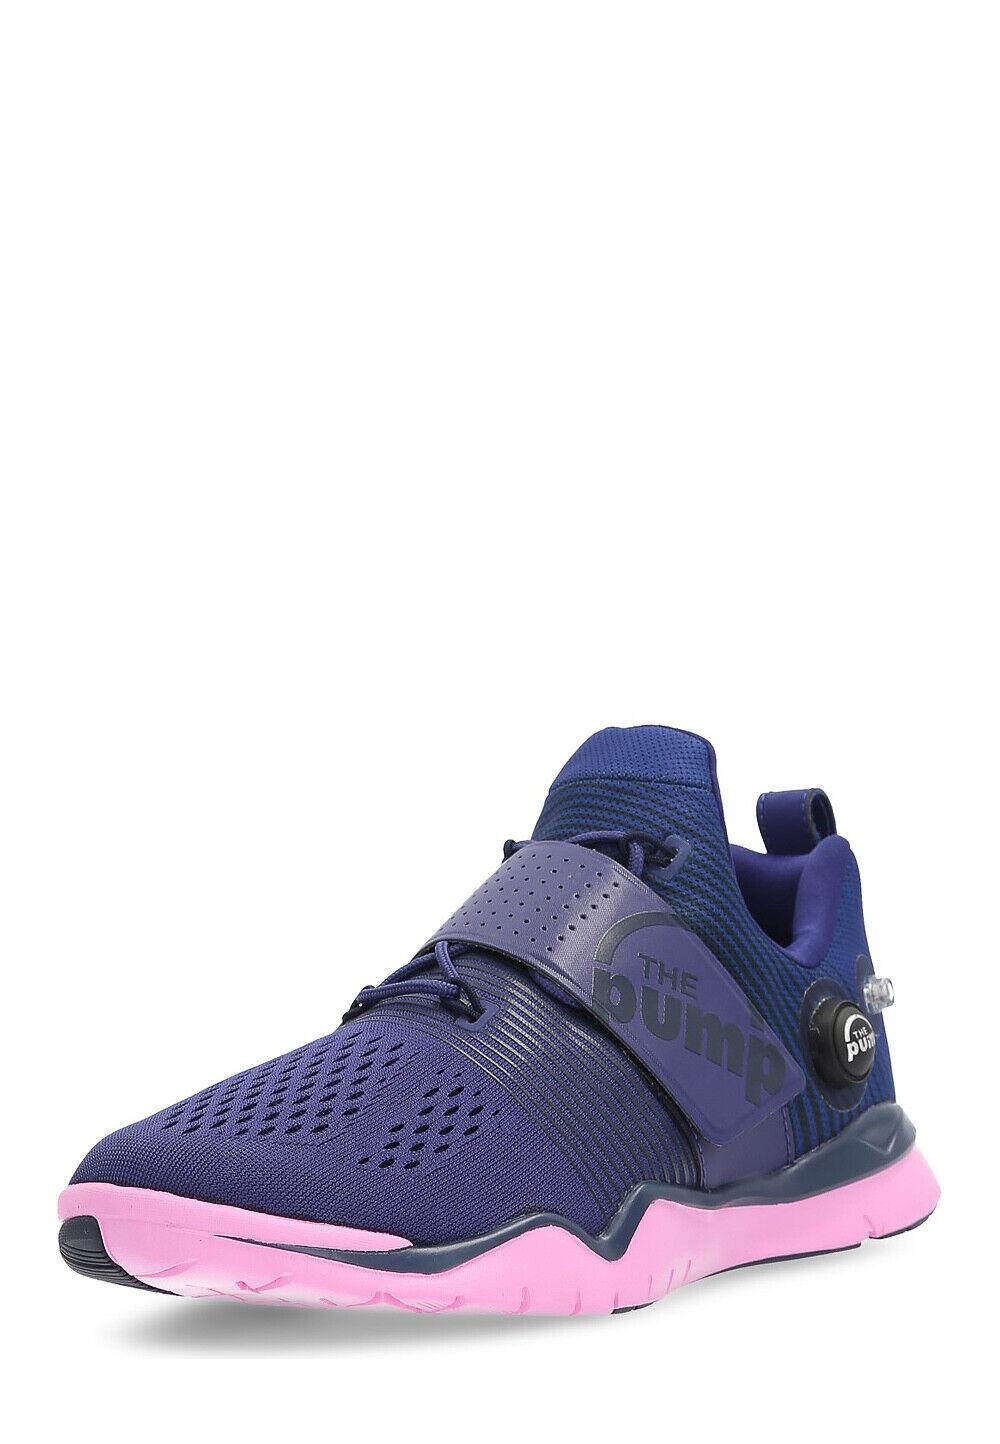 REEBOK Damen Turnschuhe Schuhe Turn Sport Lauf